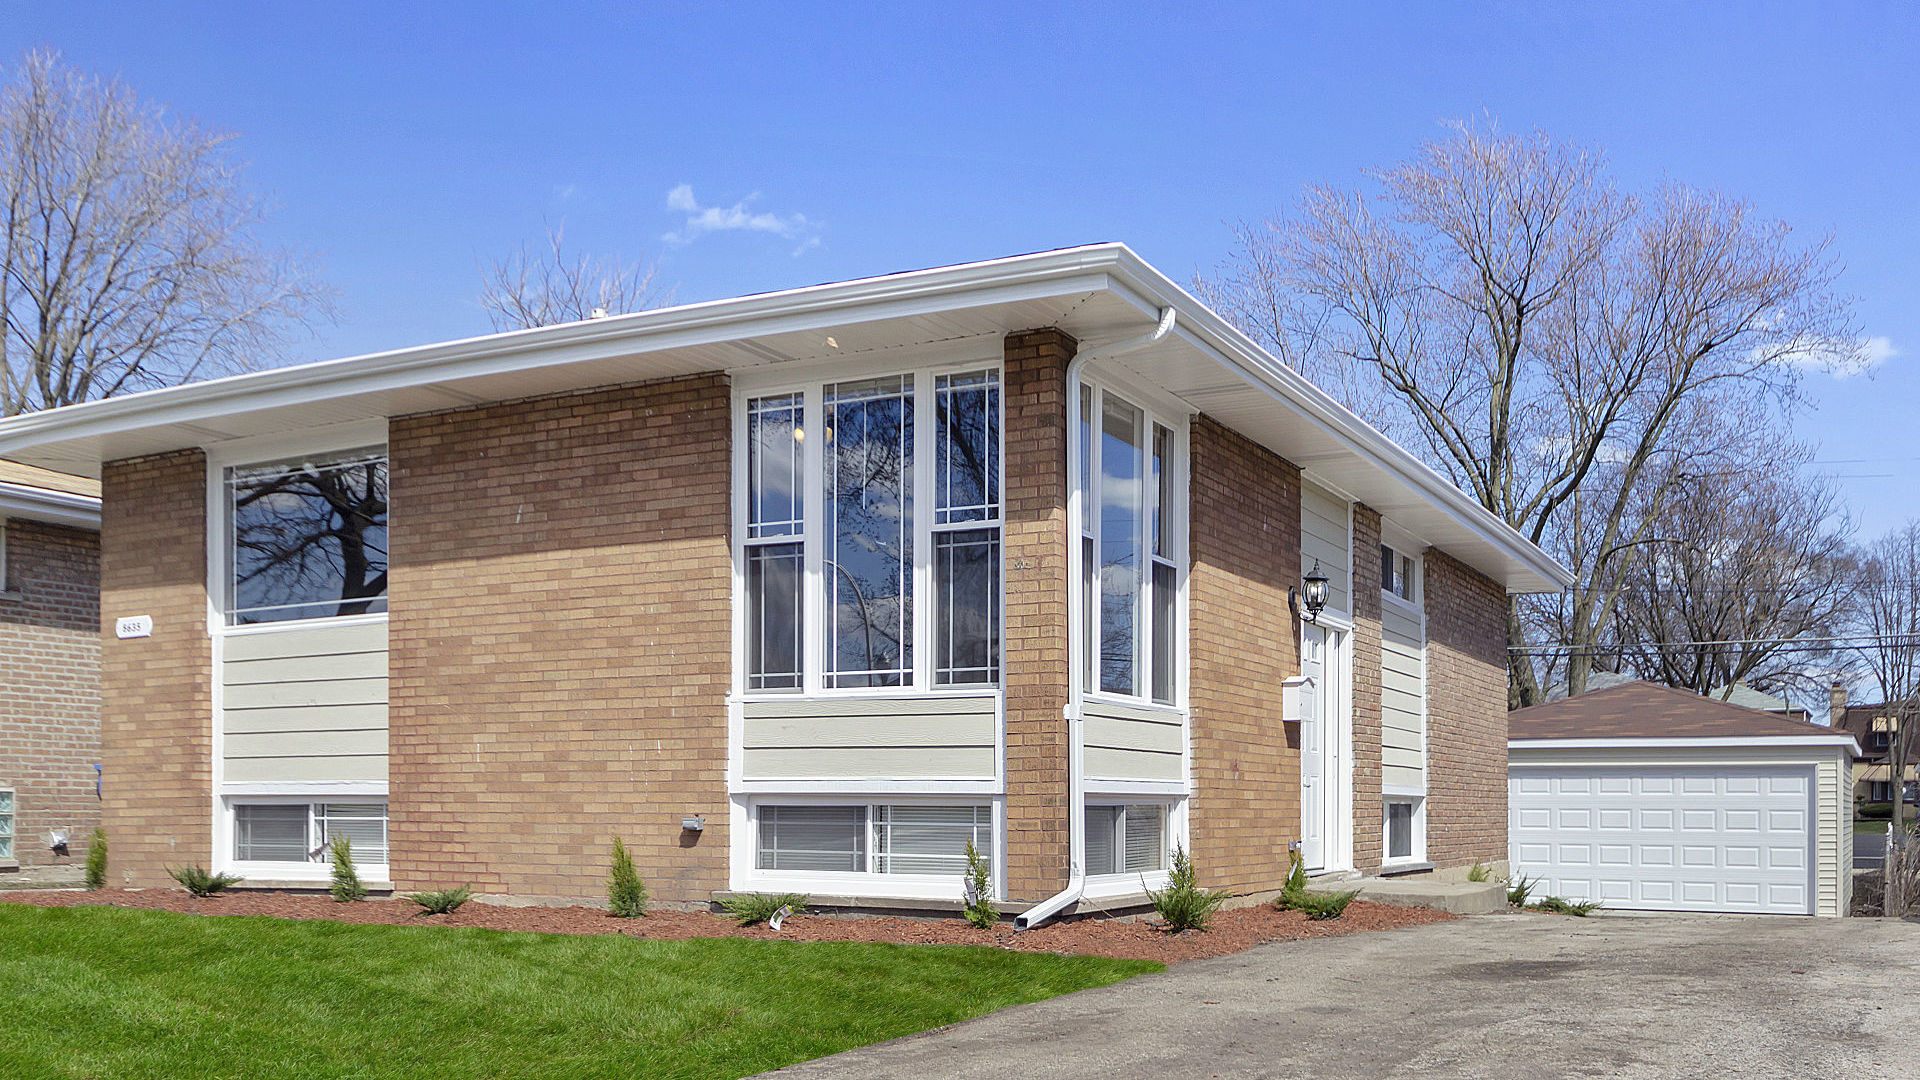 8635 S Kenwood Exterior Photo